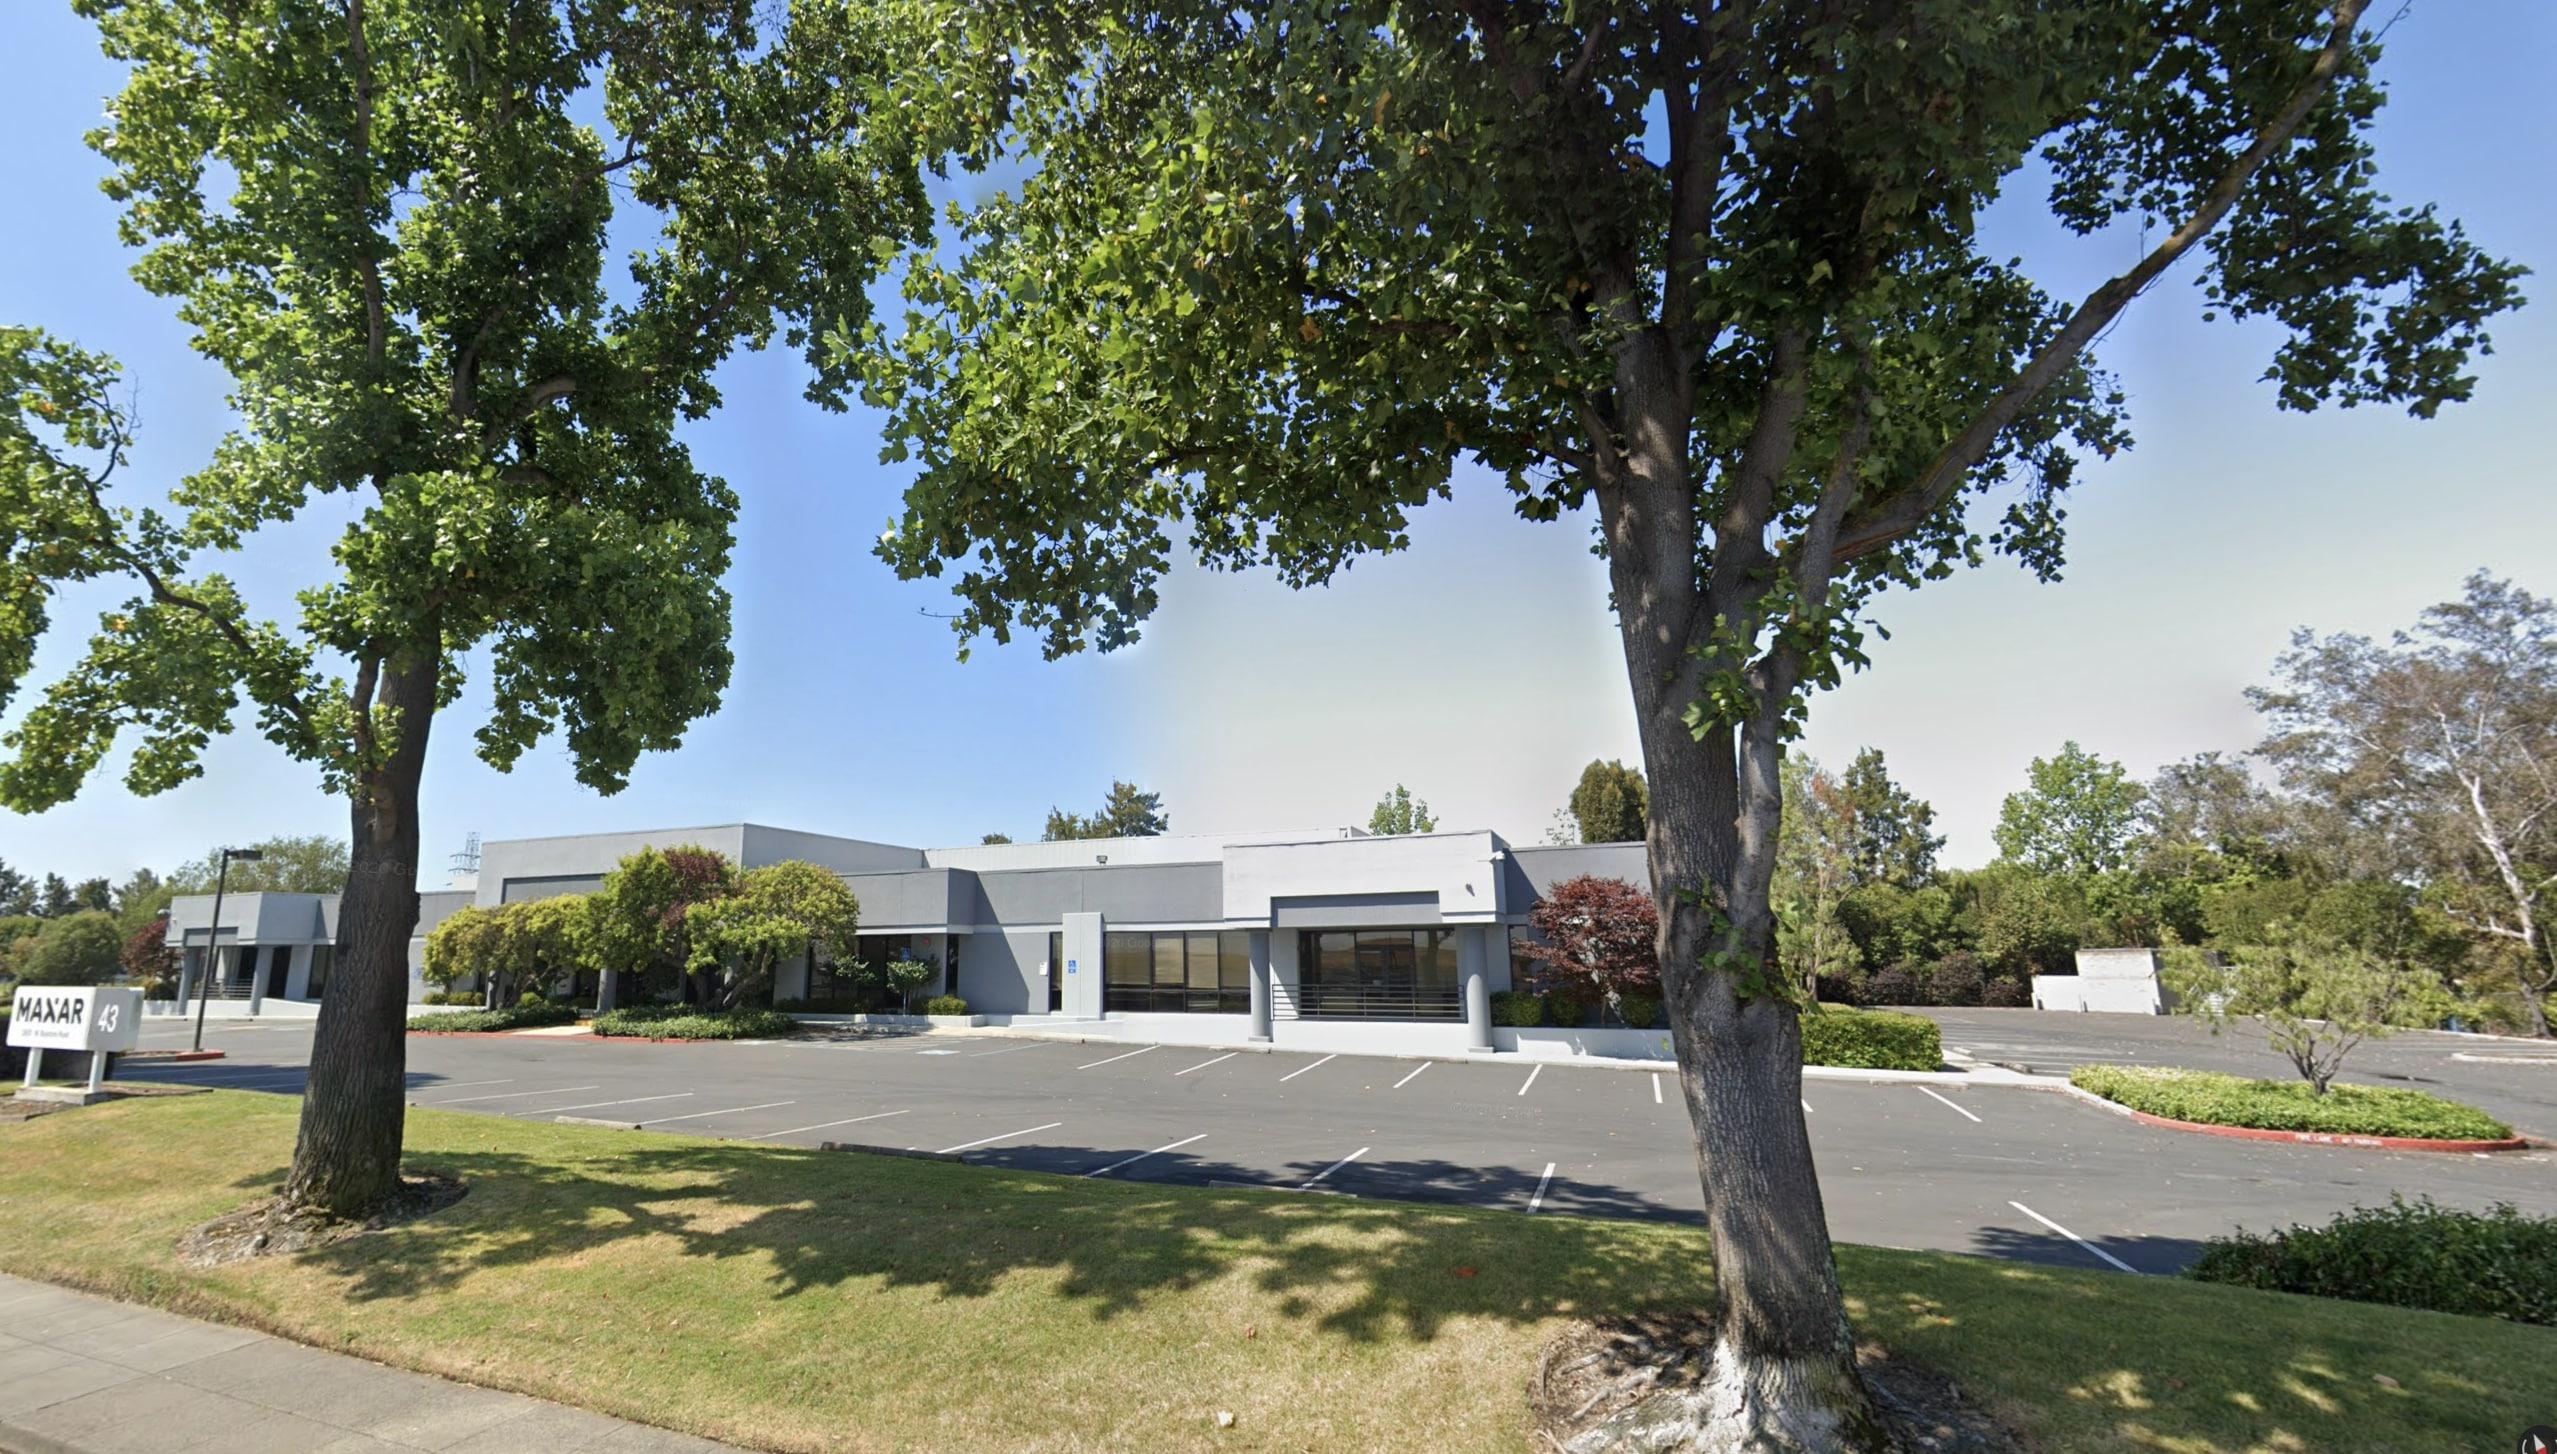 2850 West Bayshore Road via Google Maps